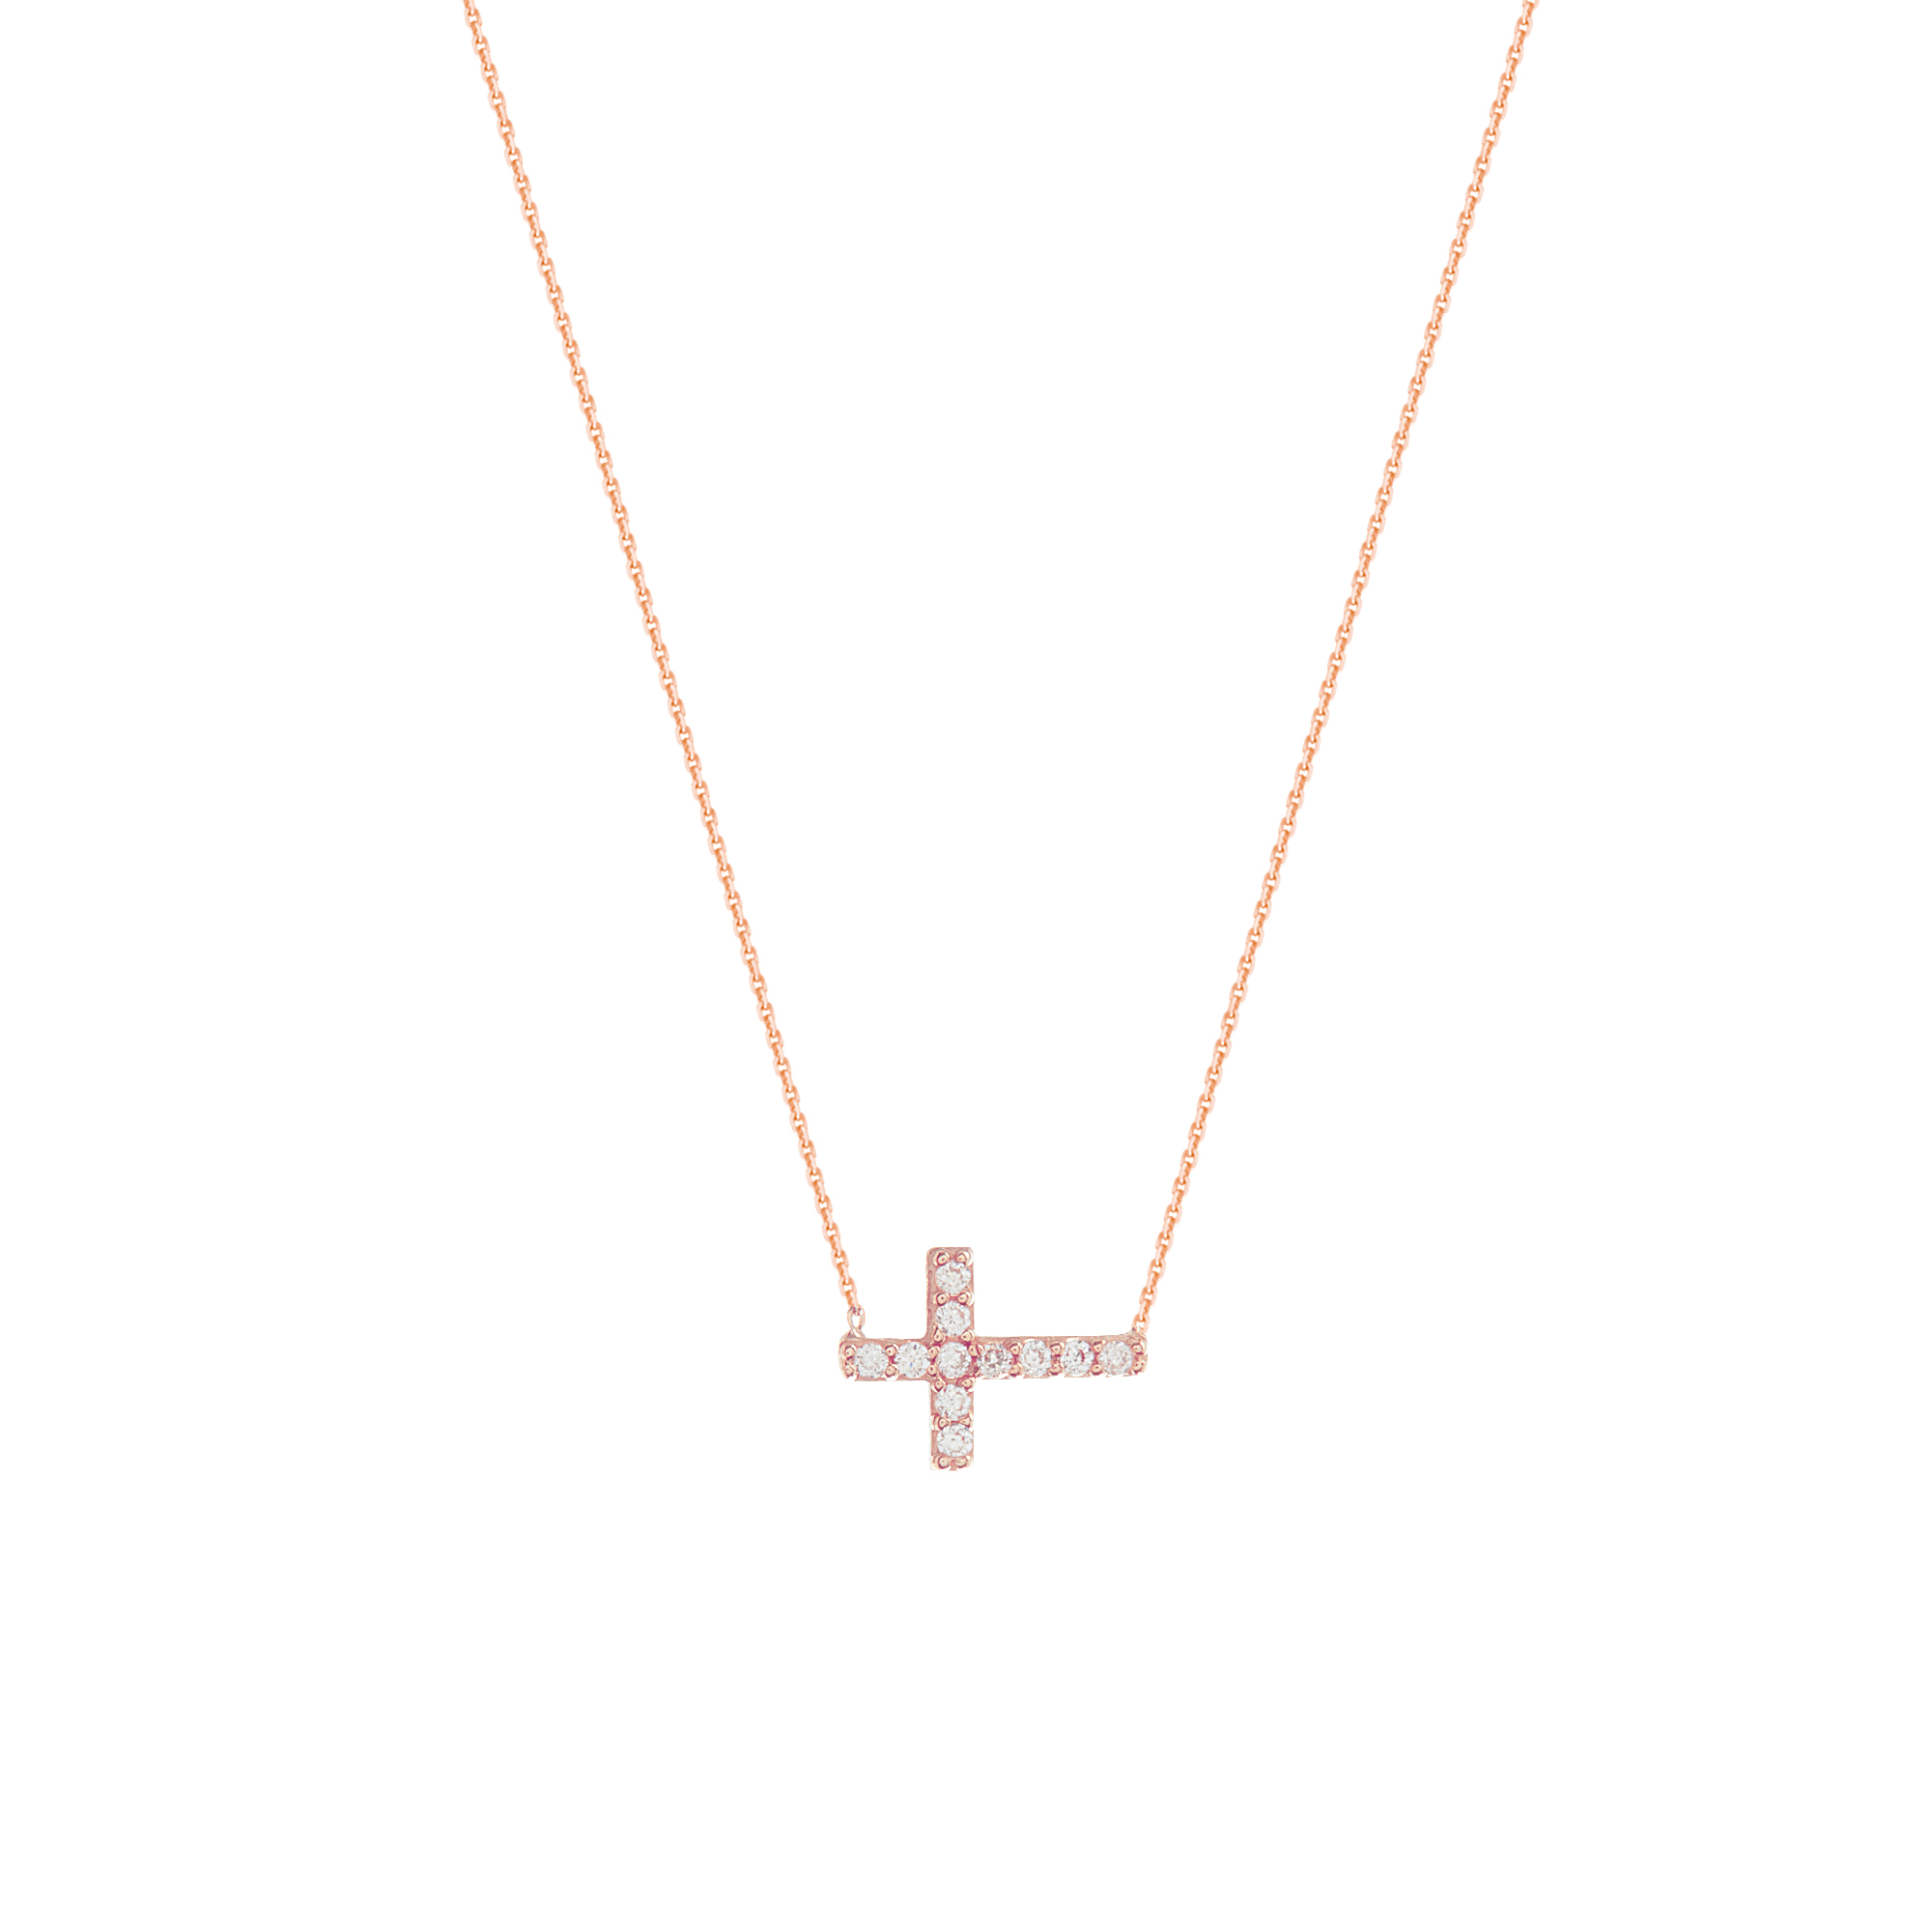 Cross Necklace, 14Kt Gold & Cz Cross Necklace 18